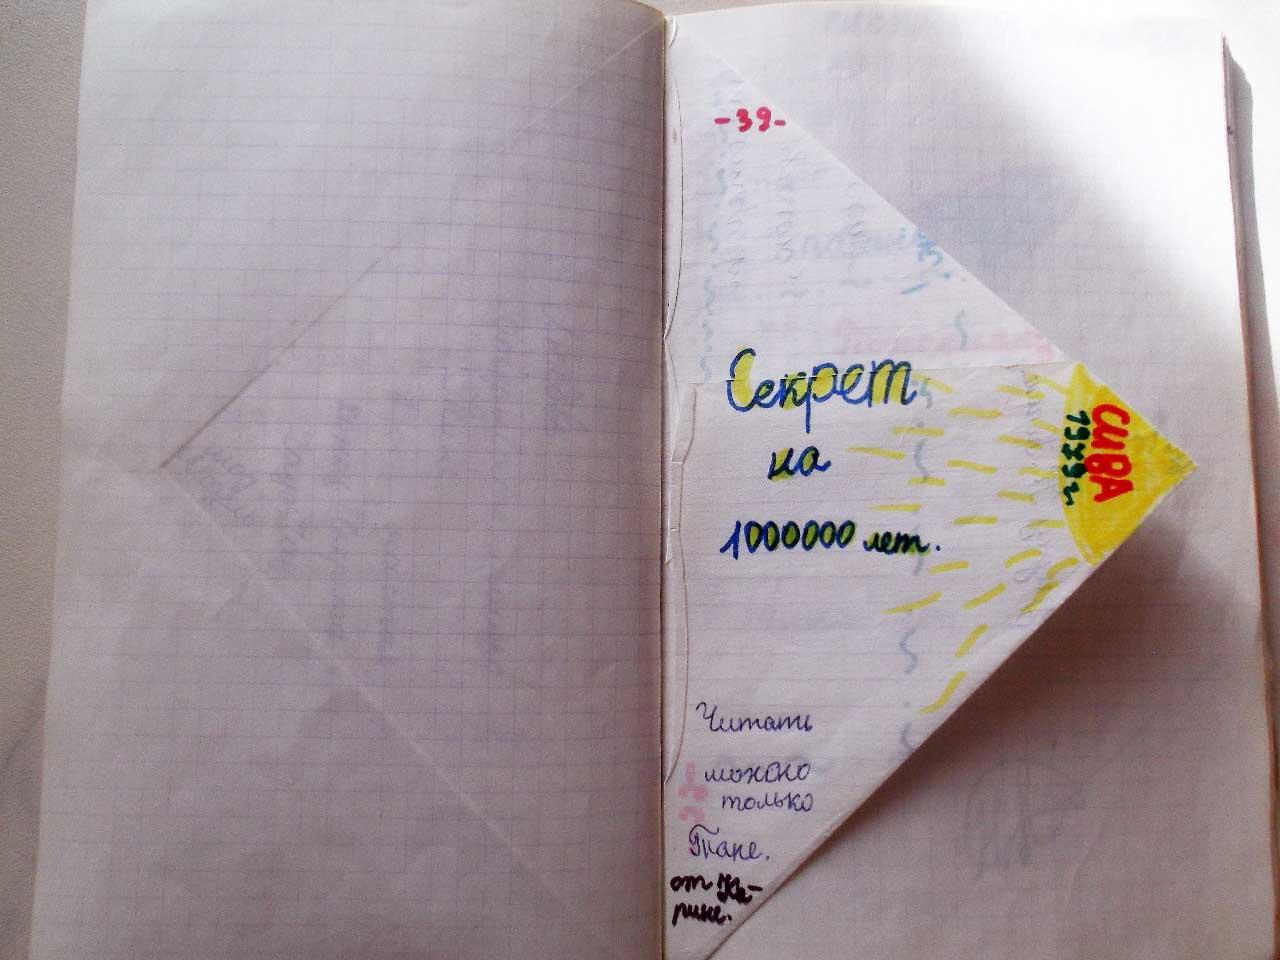 Анкета и рисунки друзей. 1979-1980. 5 класс. Лист 39